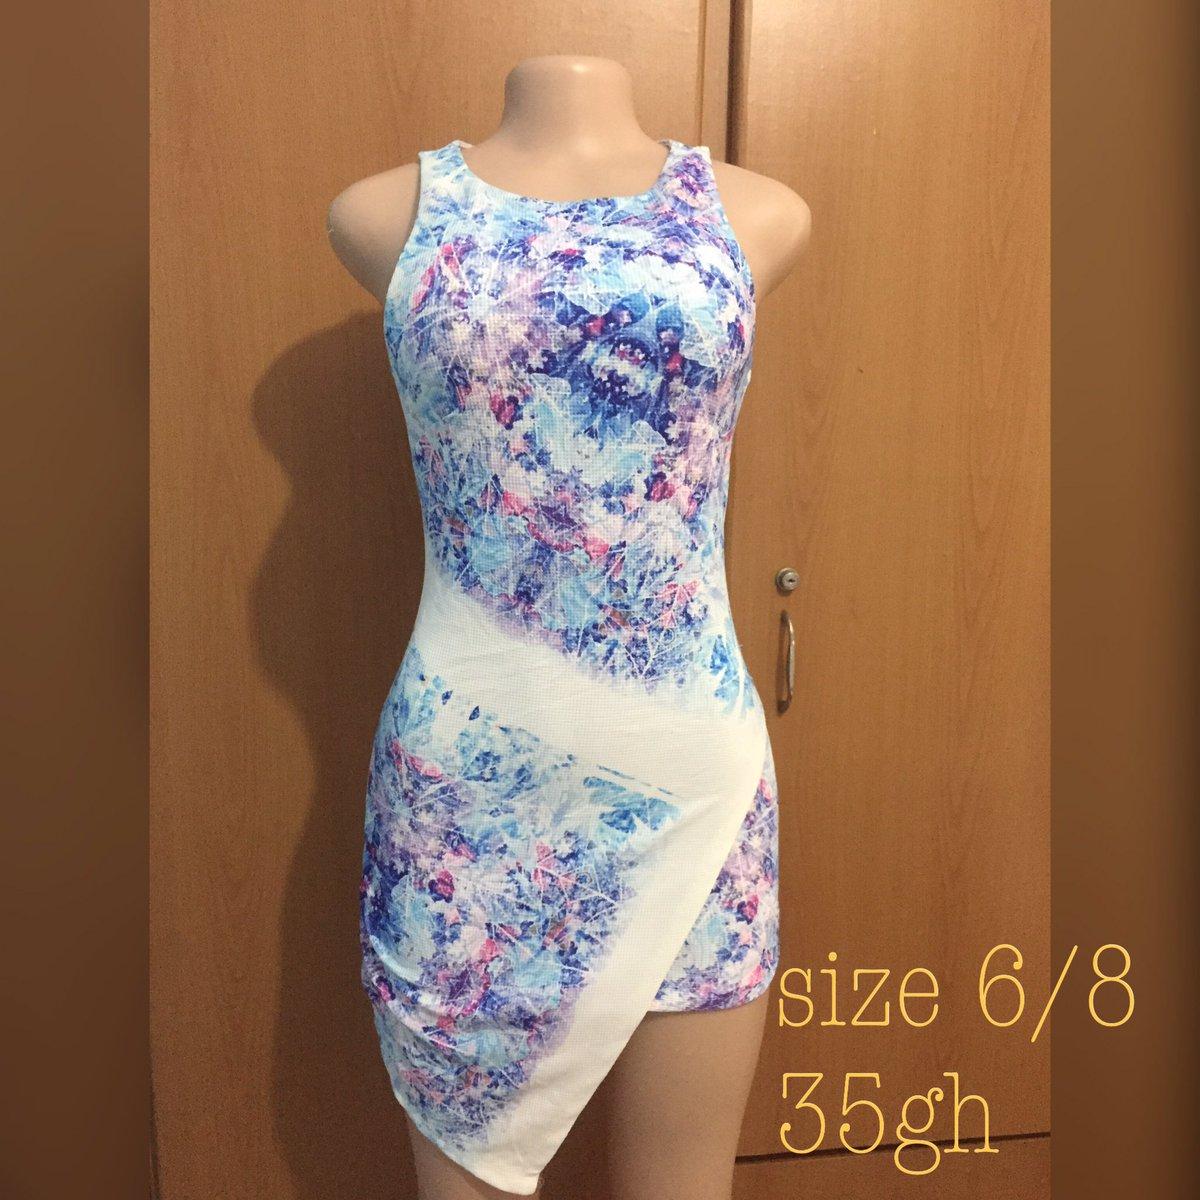 Dress available  size 6/8 35gh #slayonbudget pic.twitter.com/LncO53hOdg